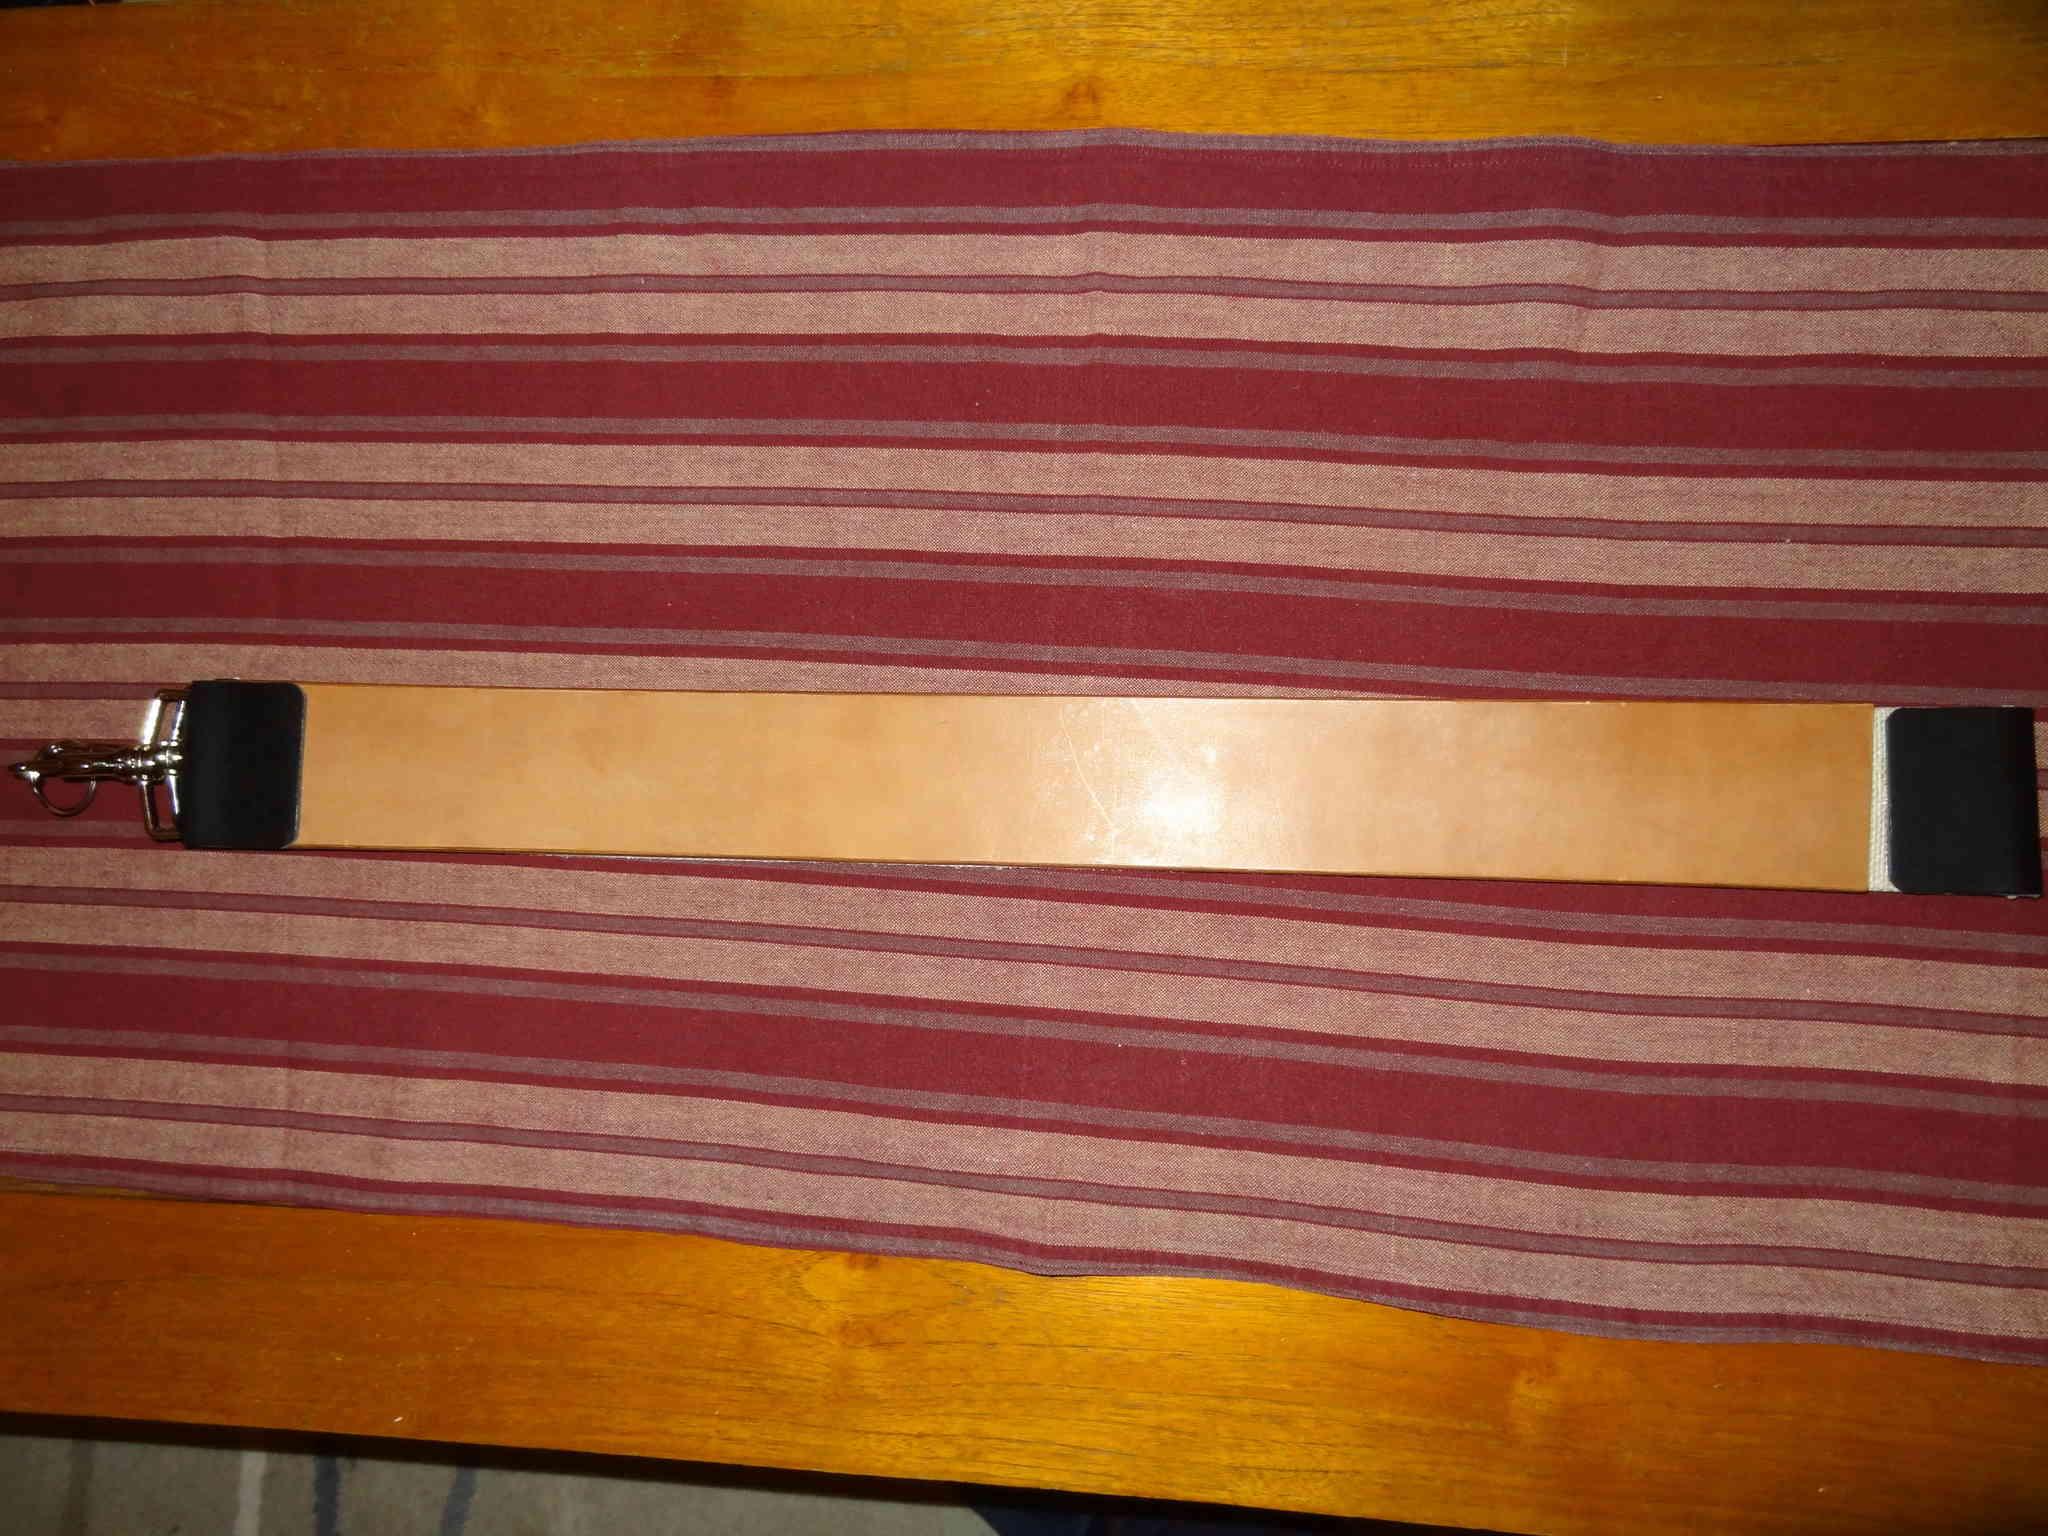 strop en cuir de cheval végétal Dsc01310